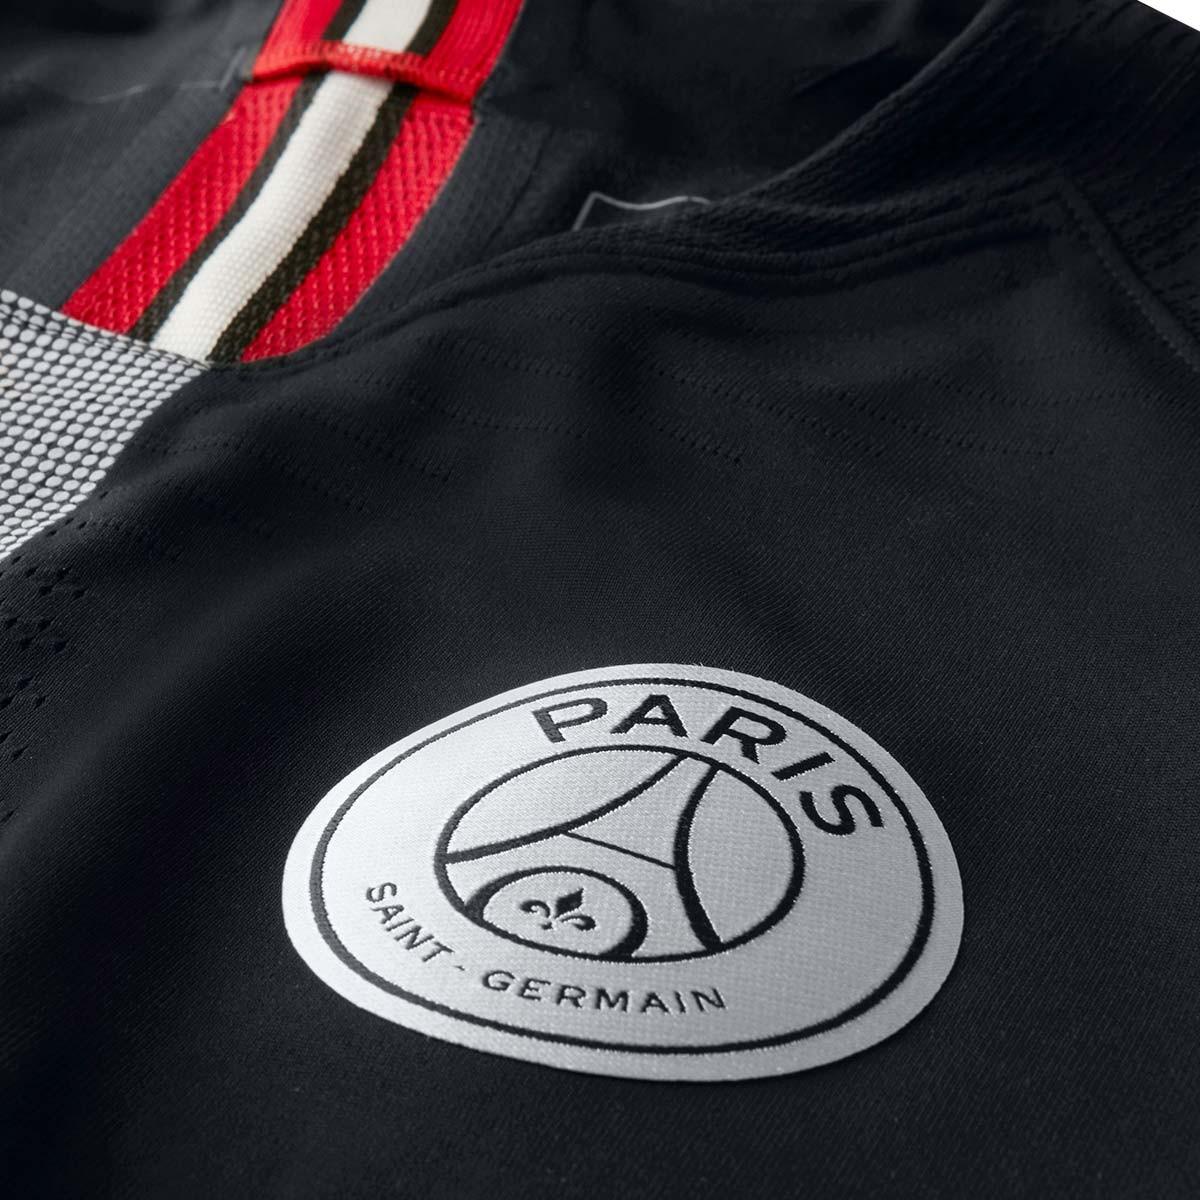 9ec7f16fe2d27 Jersey Nike Paris Saint-Germain Vapor 2018-2019 Third Black-White -  Football store Fútbol Emotion